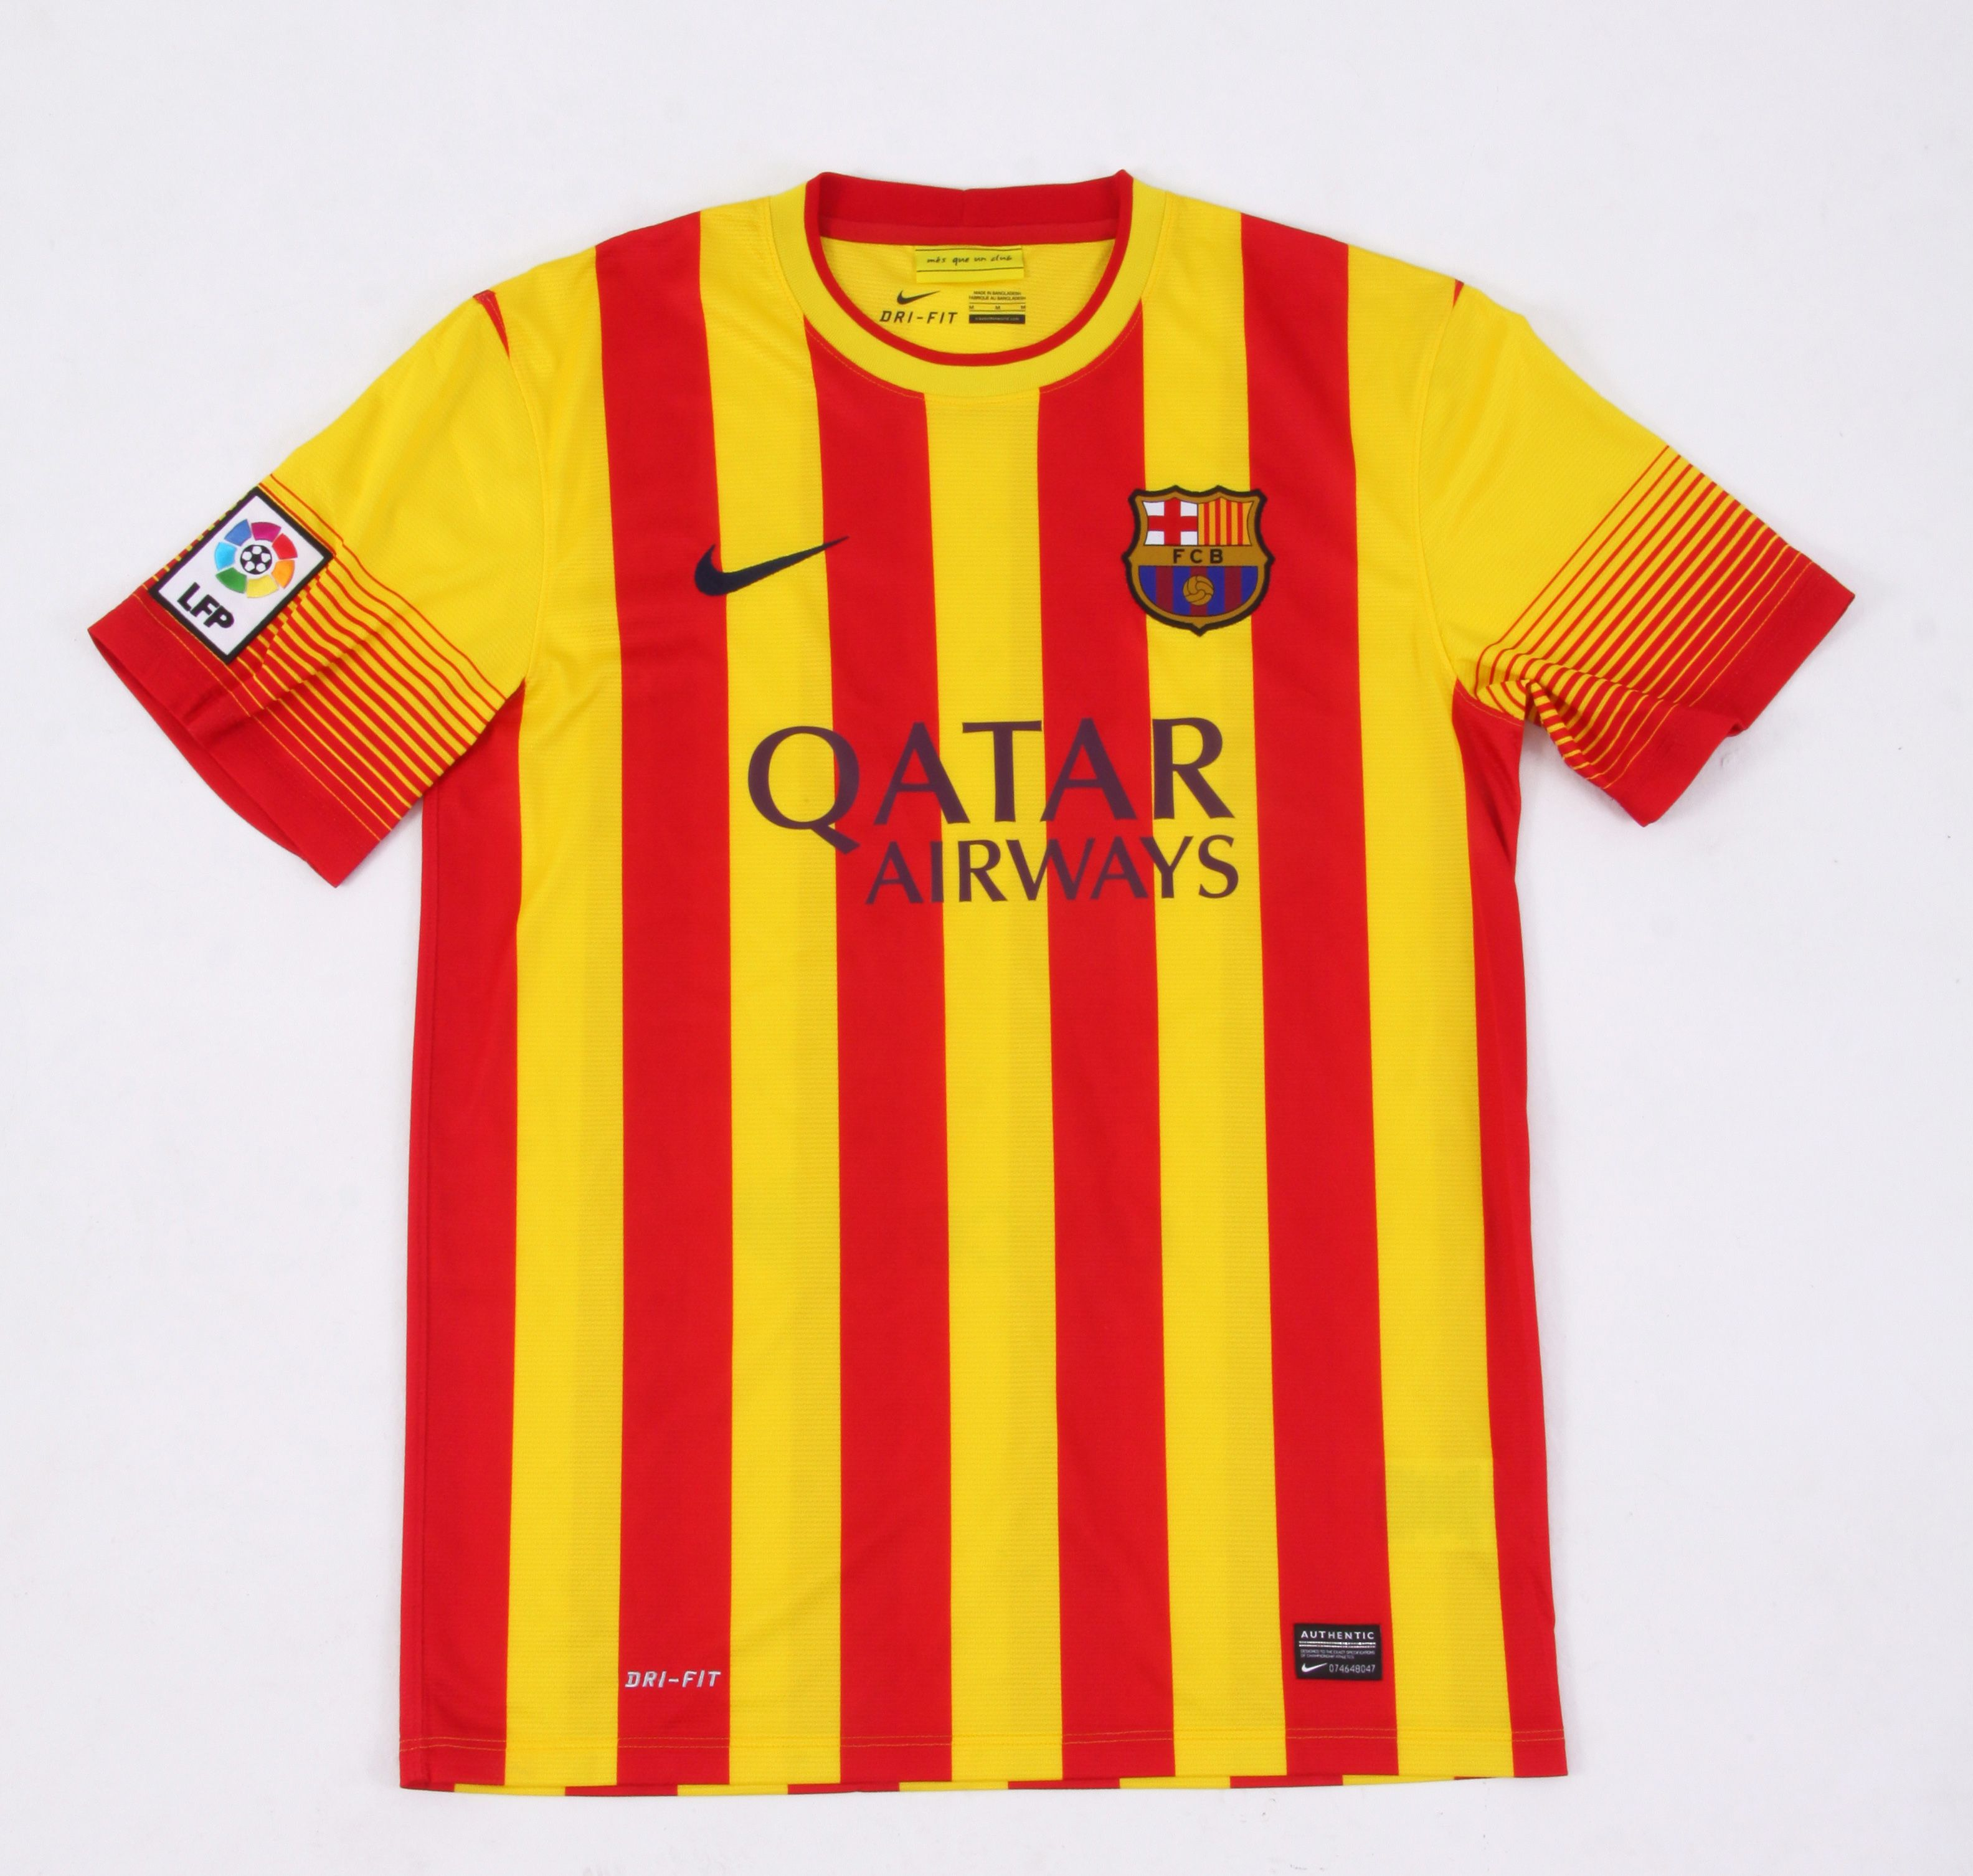 8fced550558ec NIKE - Camisa Barcelona - Uniforme 2 - R 199